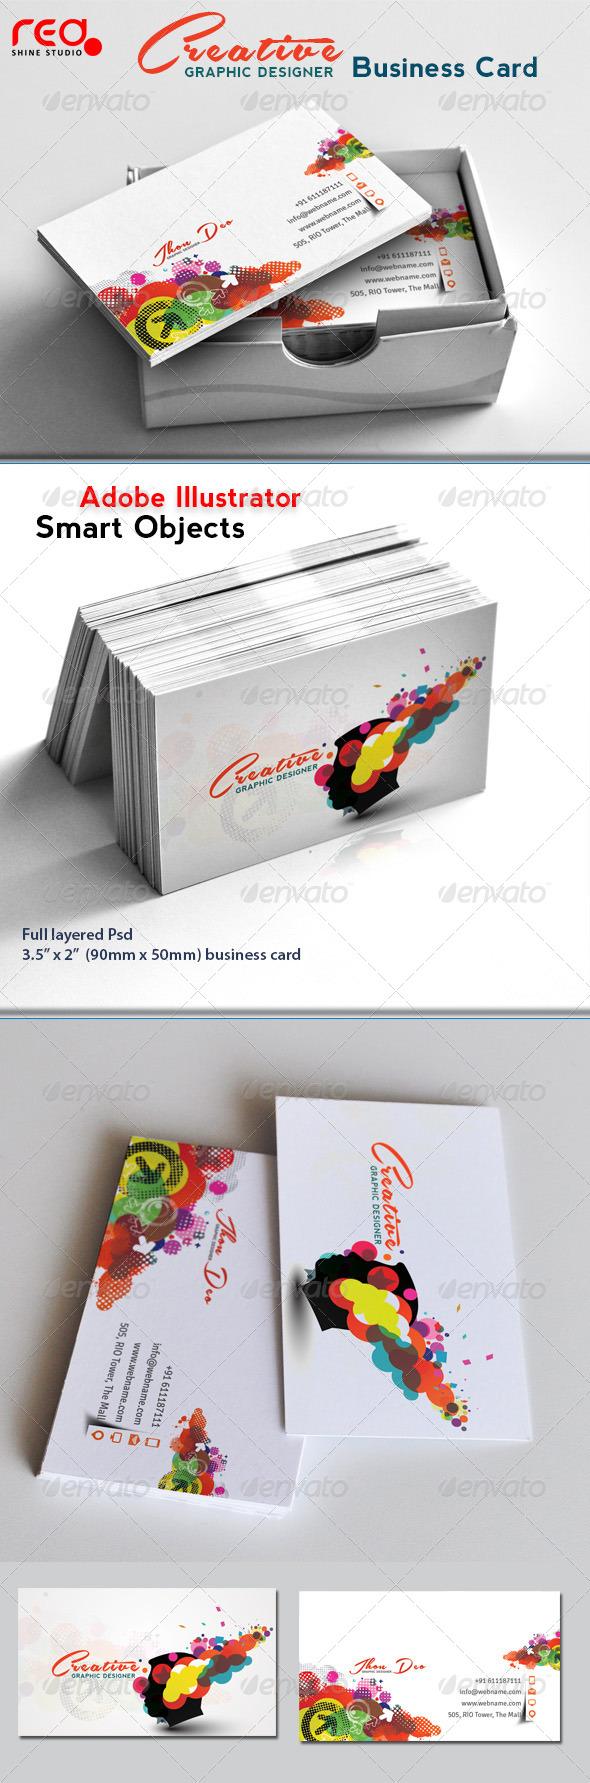 GraphicRiver Creative Elegant Business Card 4637166